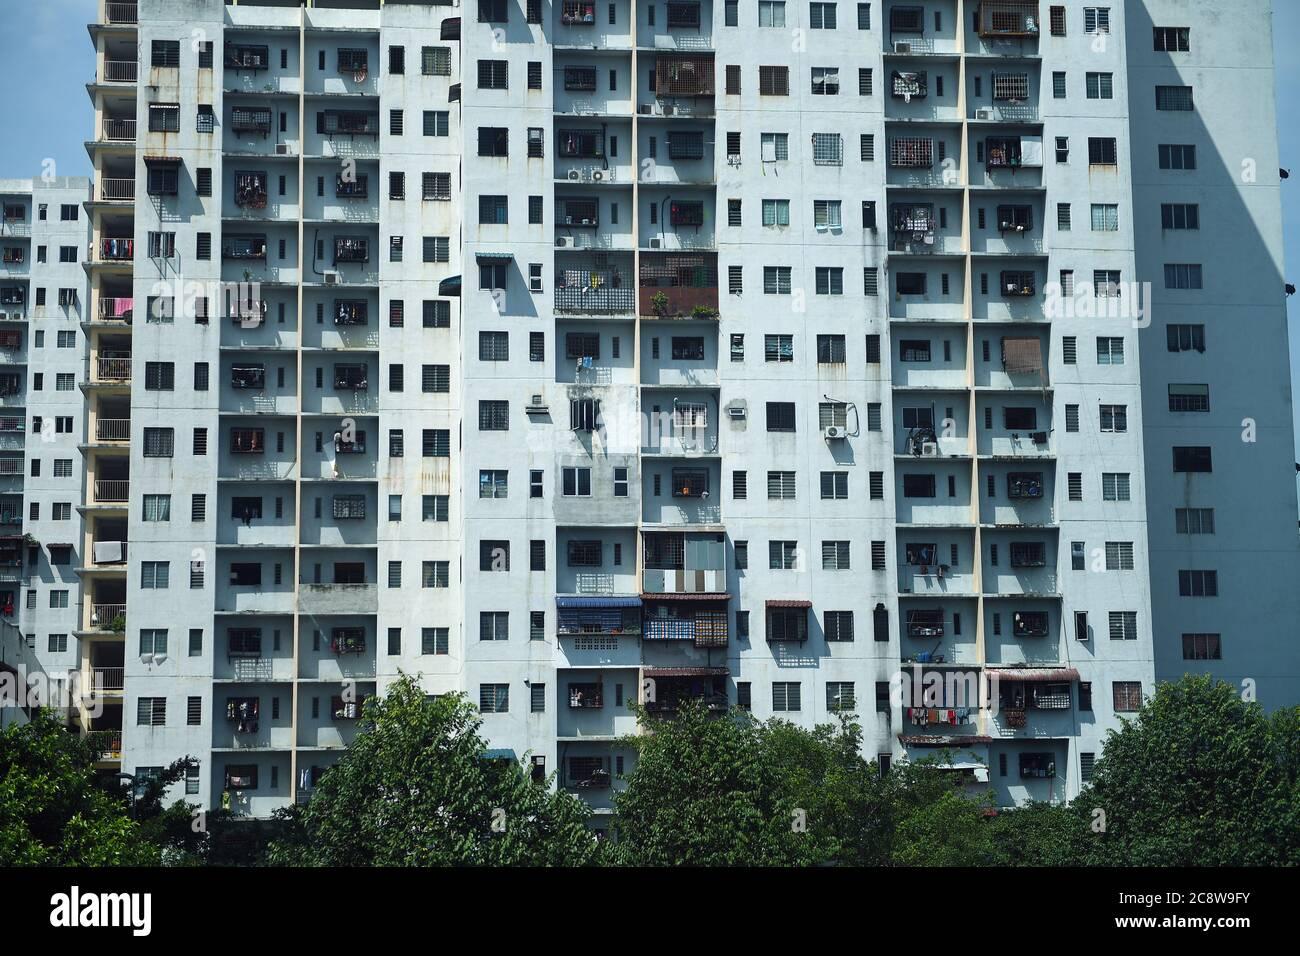 Housing tower blocks in Kuala Lumpur, Malaysia Stock Photo